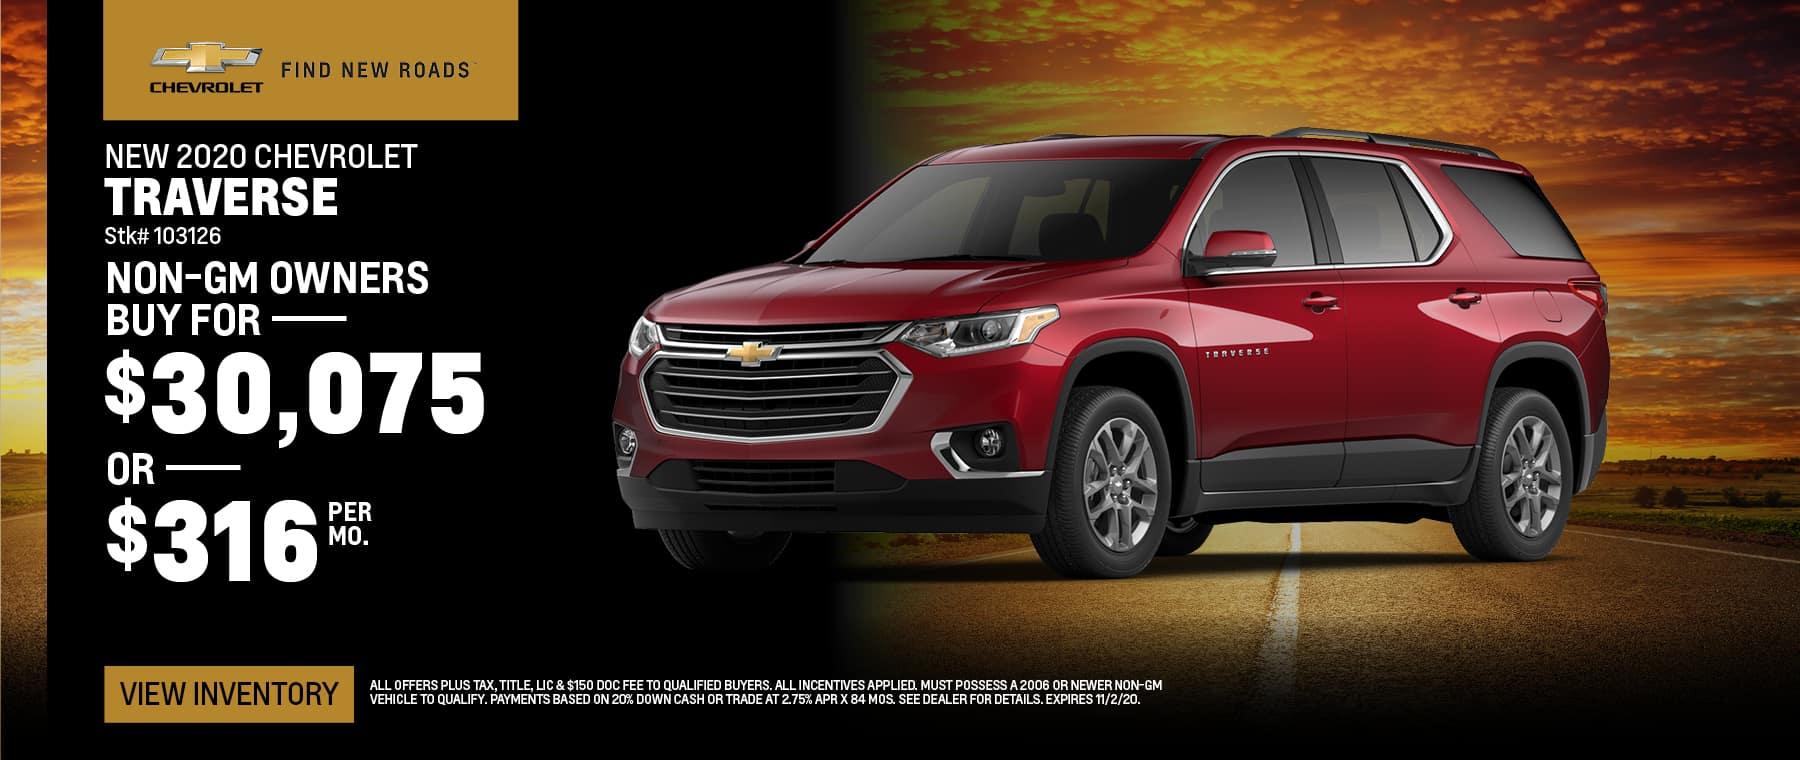 New 2020 Chevrolet Traverse